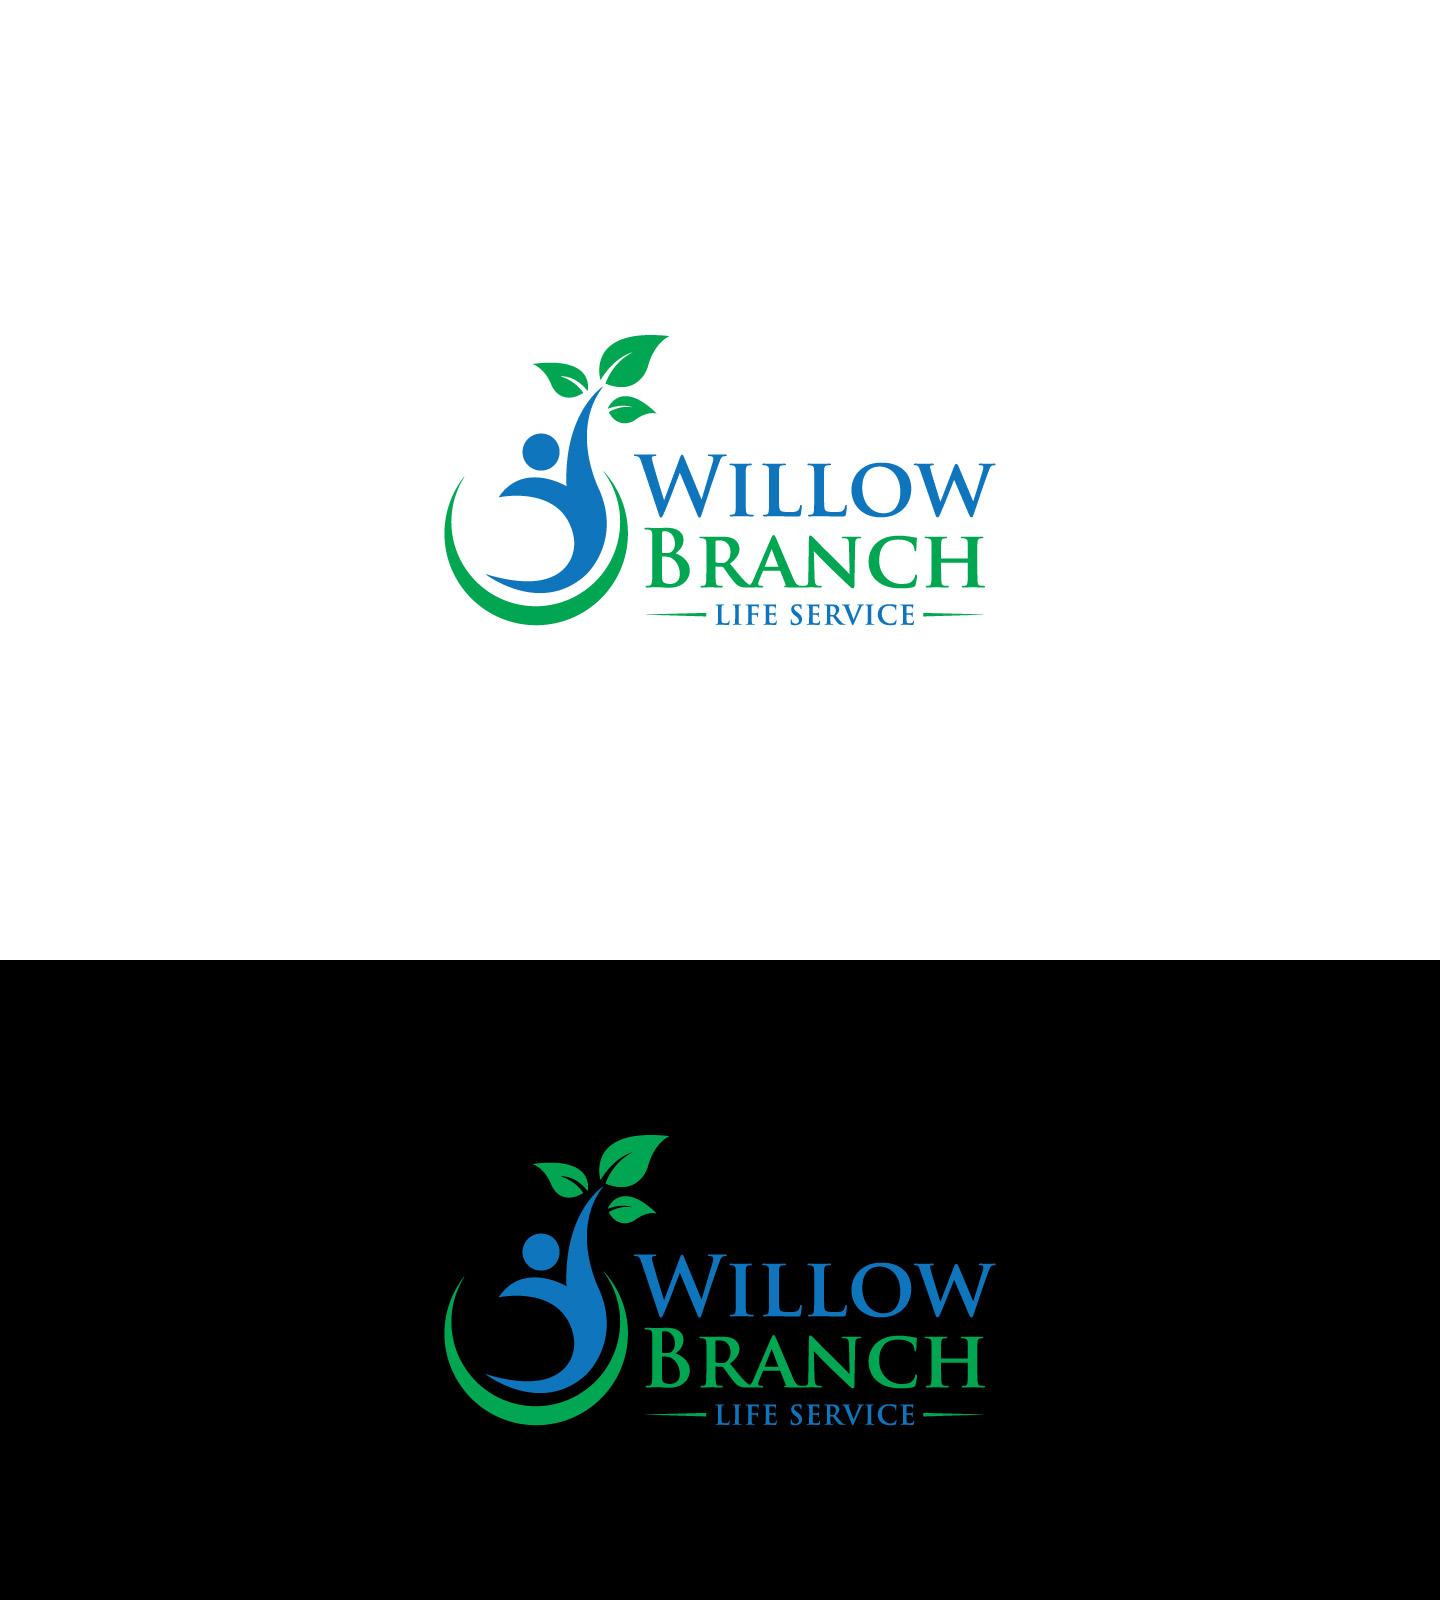 Logo Design by Raiyan Kabir - Entry No. 72 in the Logo Design Contest Artistic Logo Design for Willow Branch Life Service.